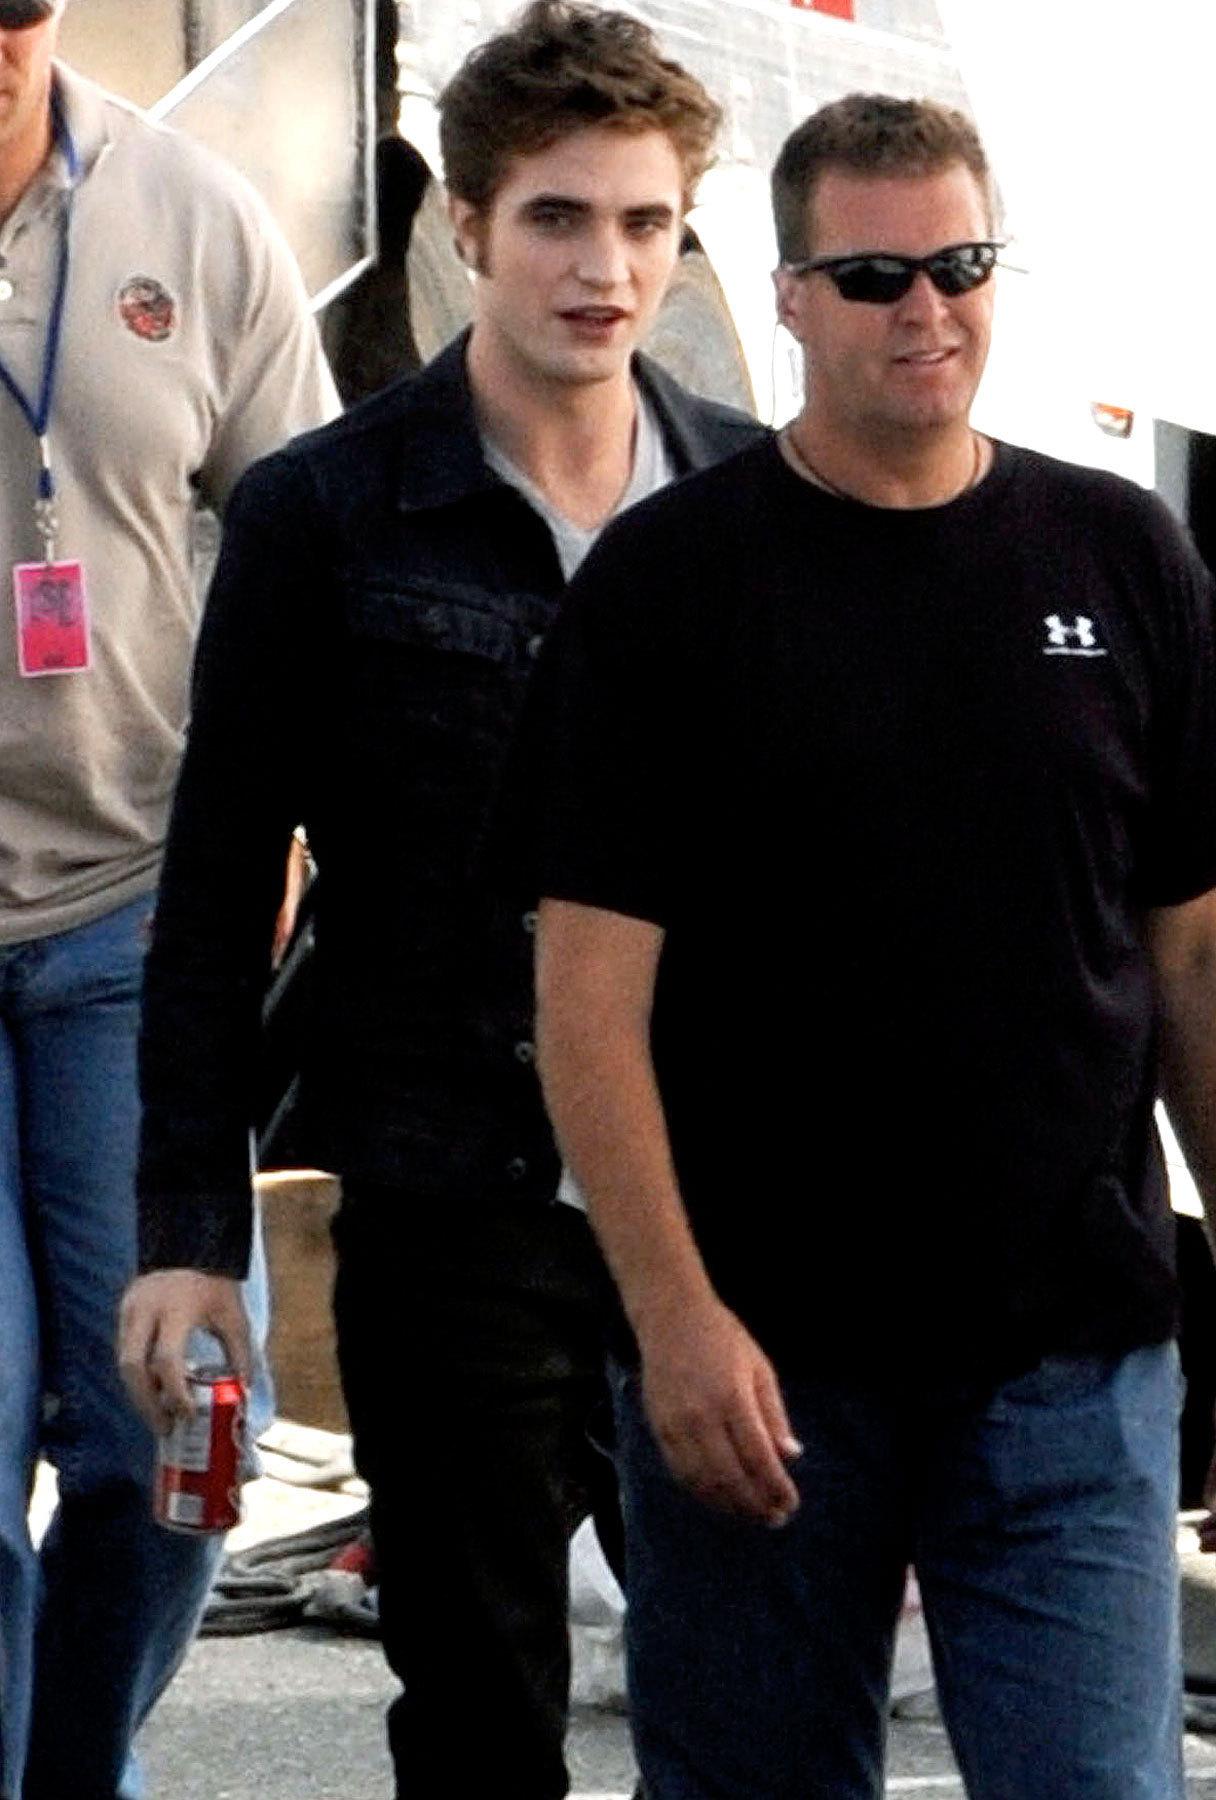 Robert Pattinson Shoots Eclipse